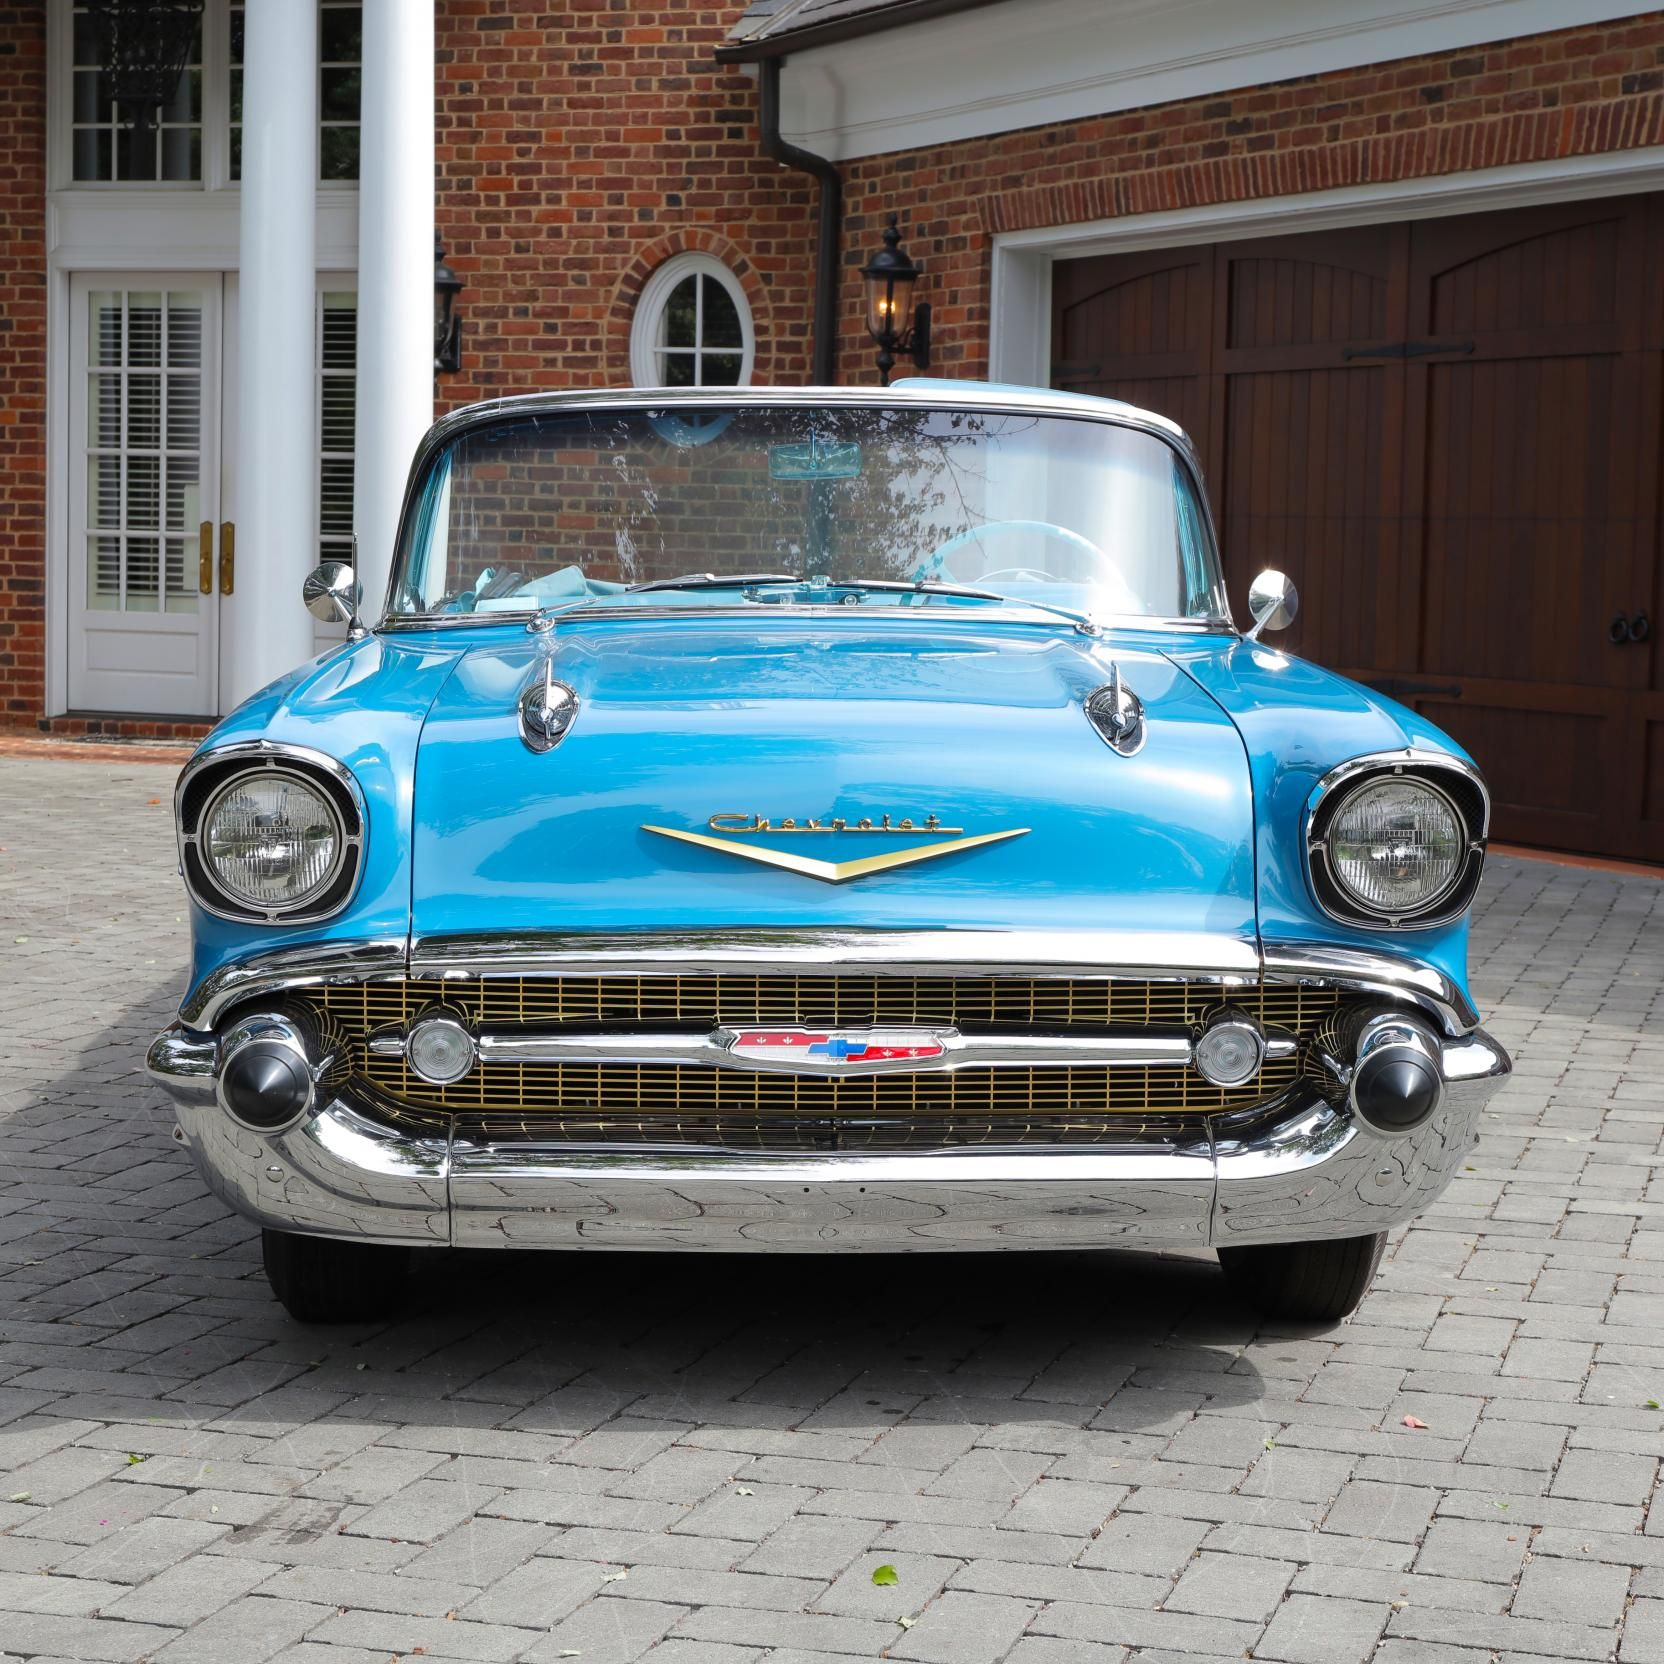 1957 Chevrolet Bel Air Convertible Chevrolet Bel Air 1957 Chevrolet Chevrolet